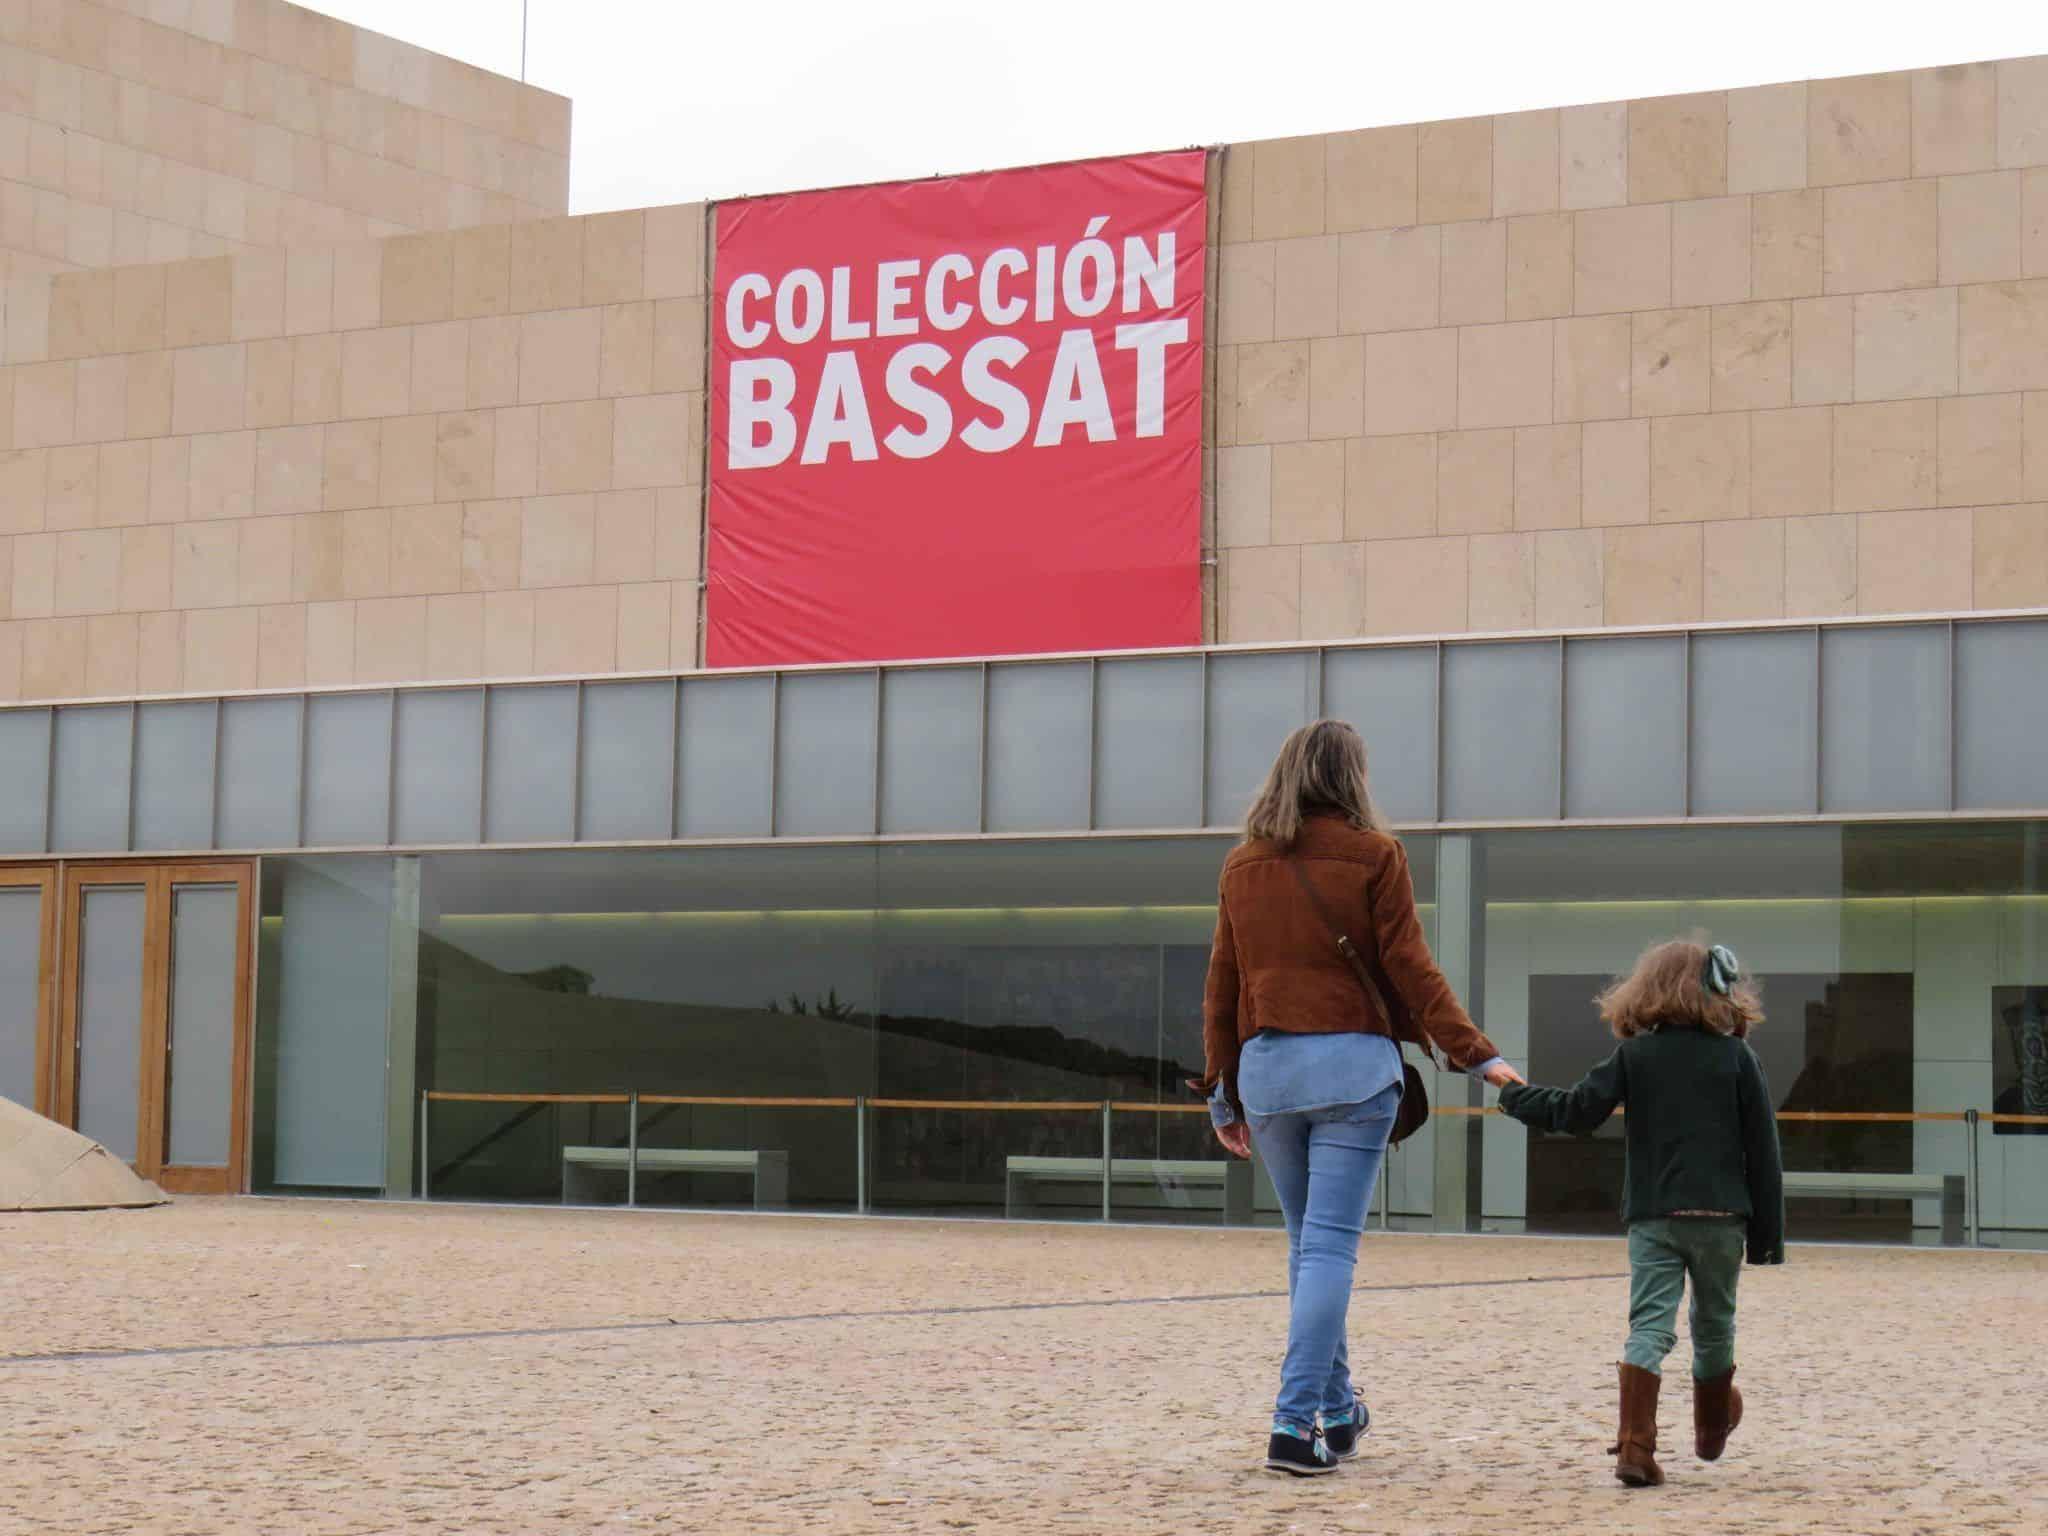 Colección Bassat en Ávila